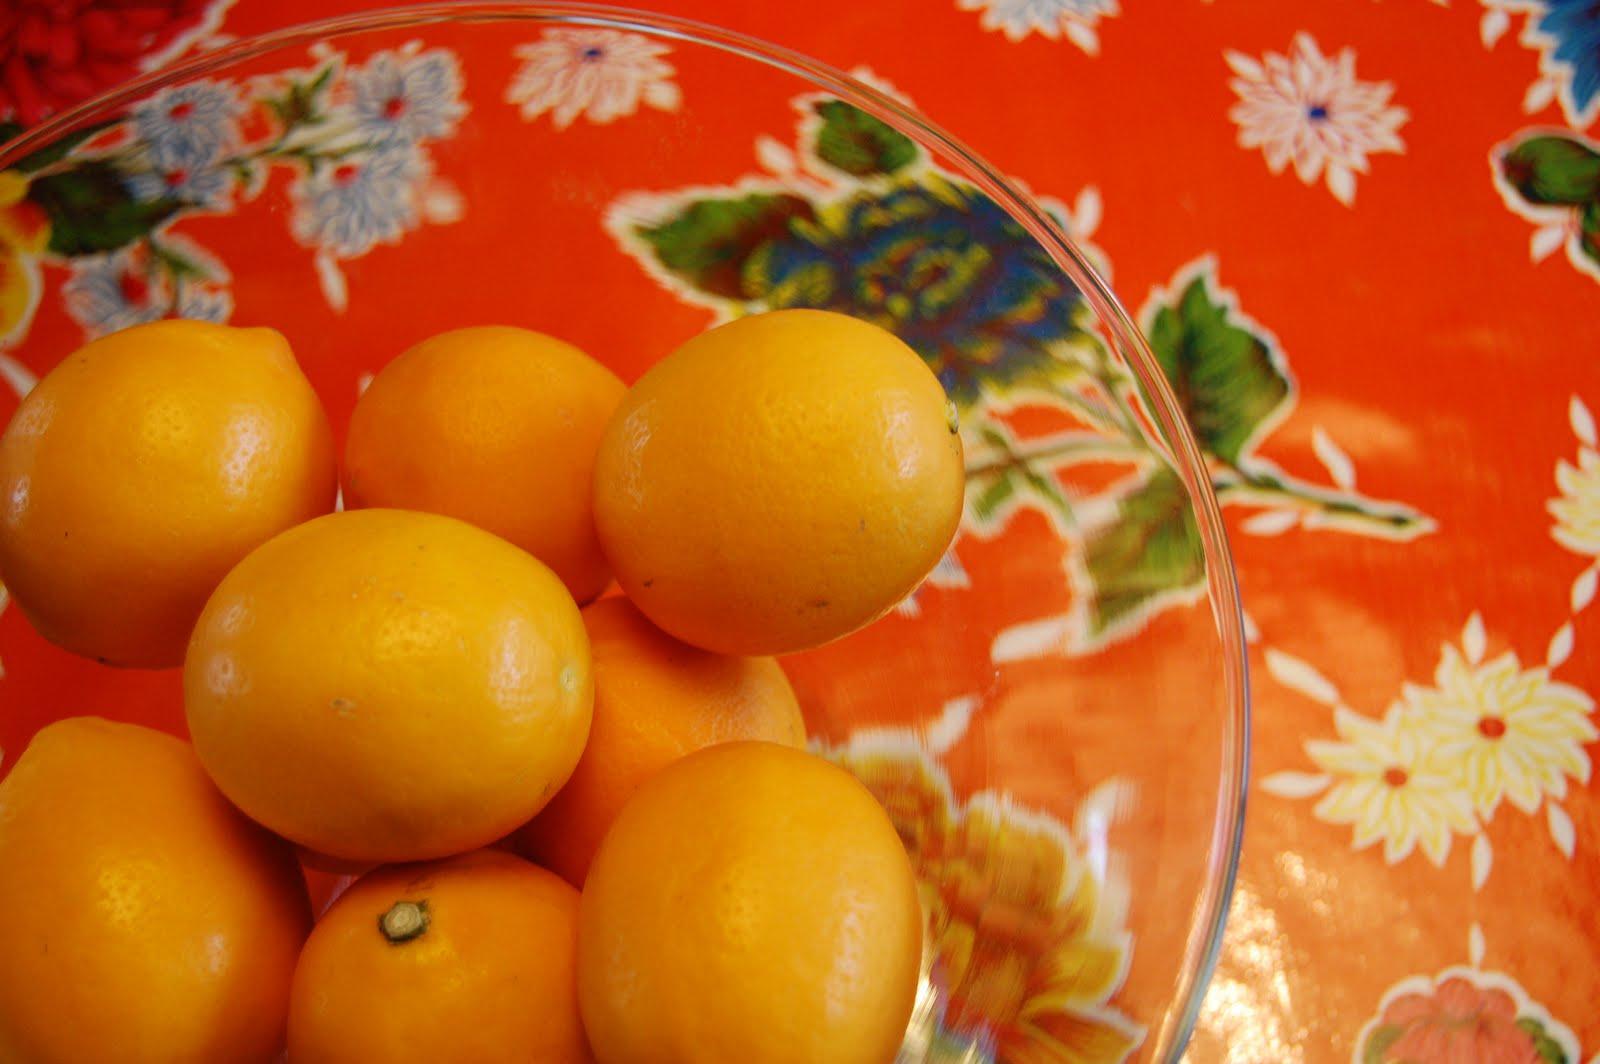 [lemons]